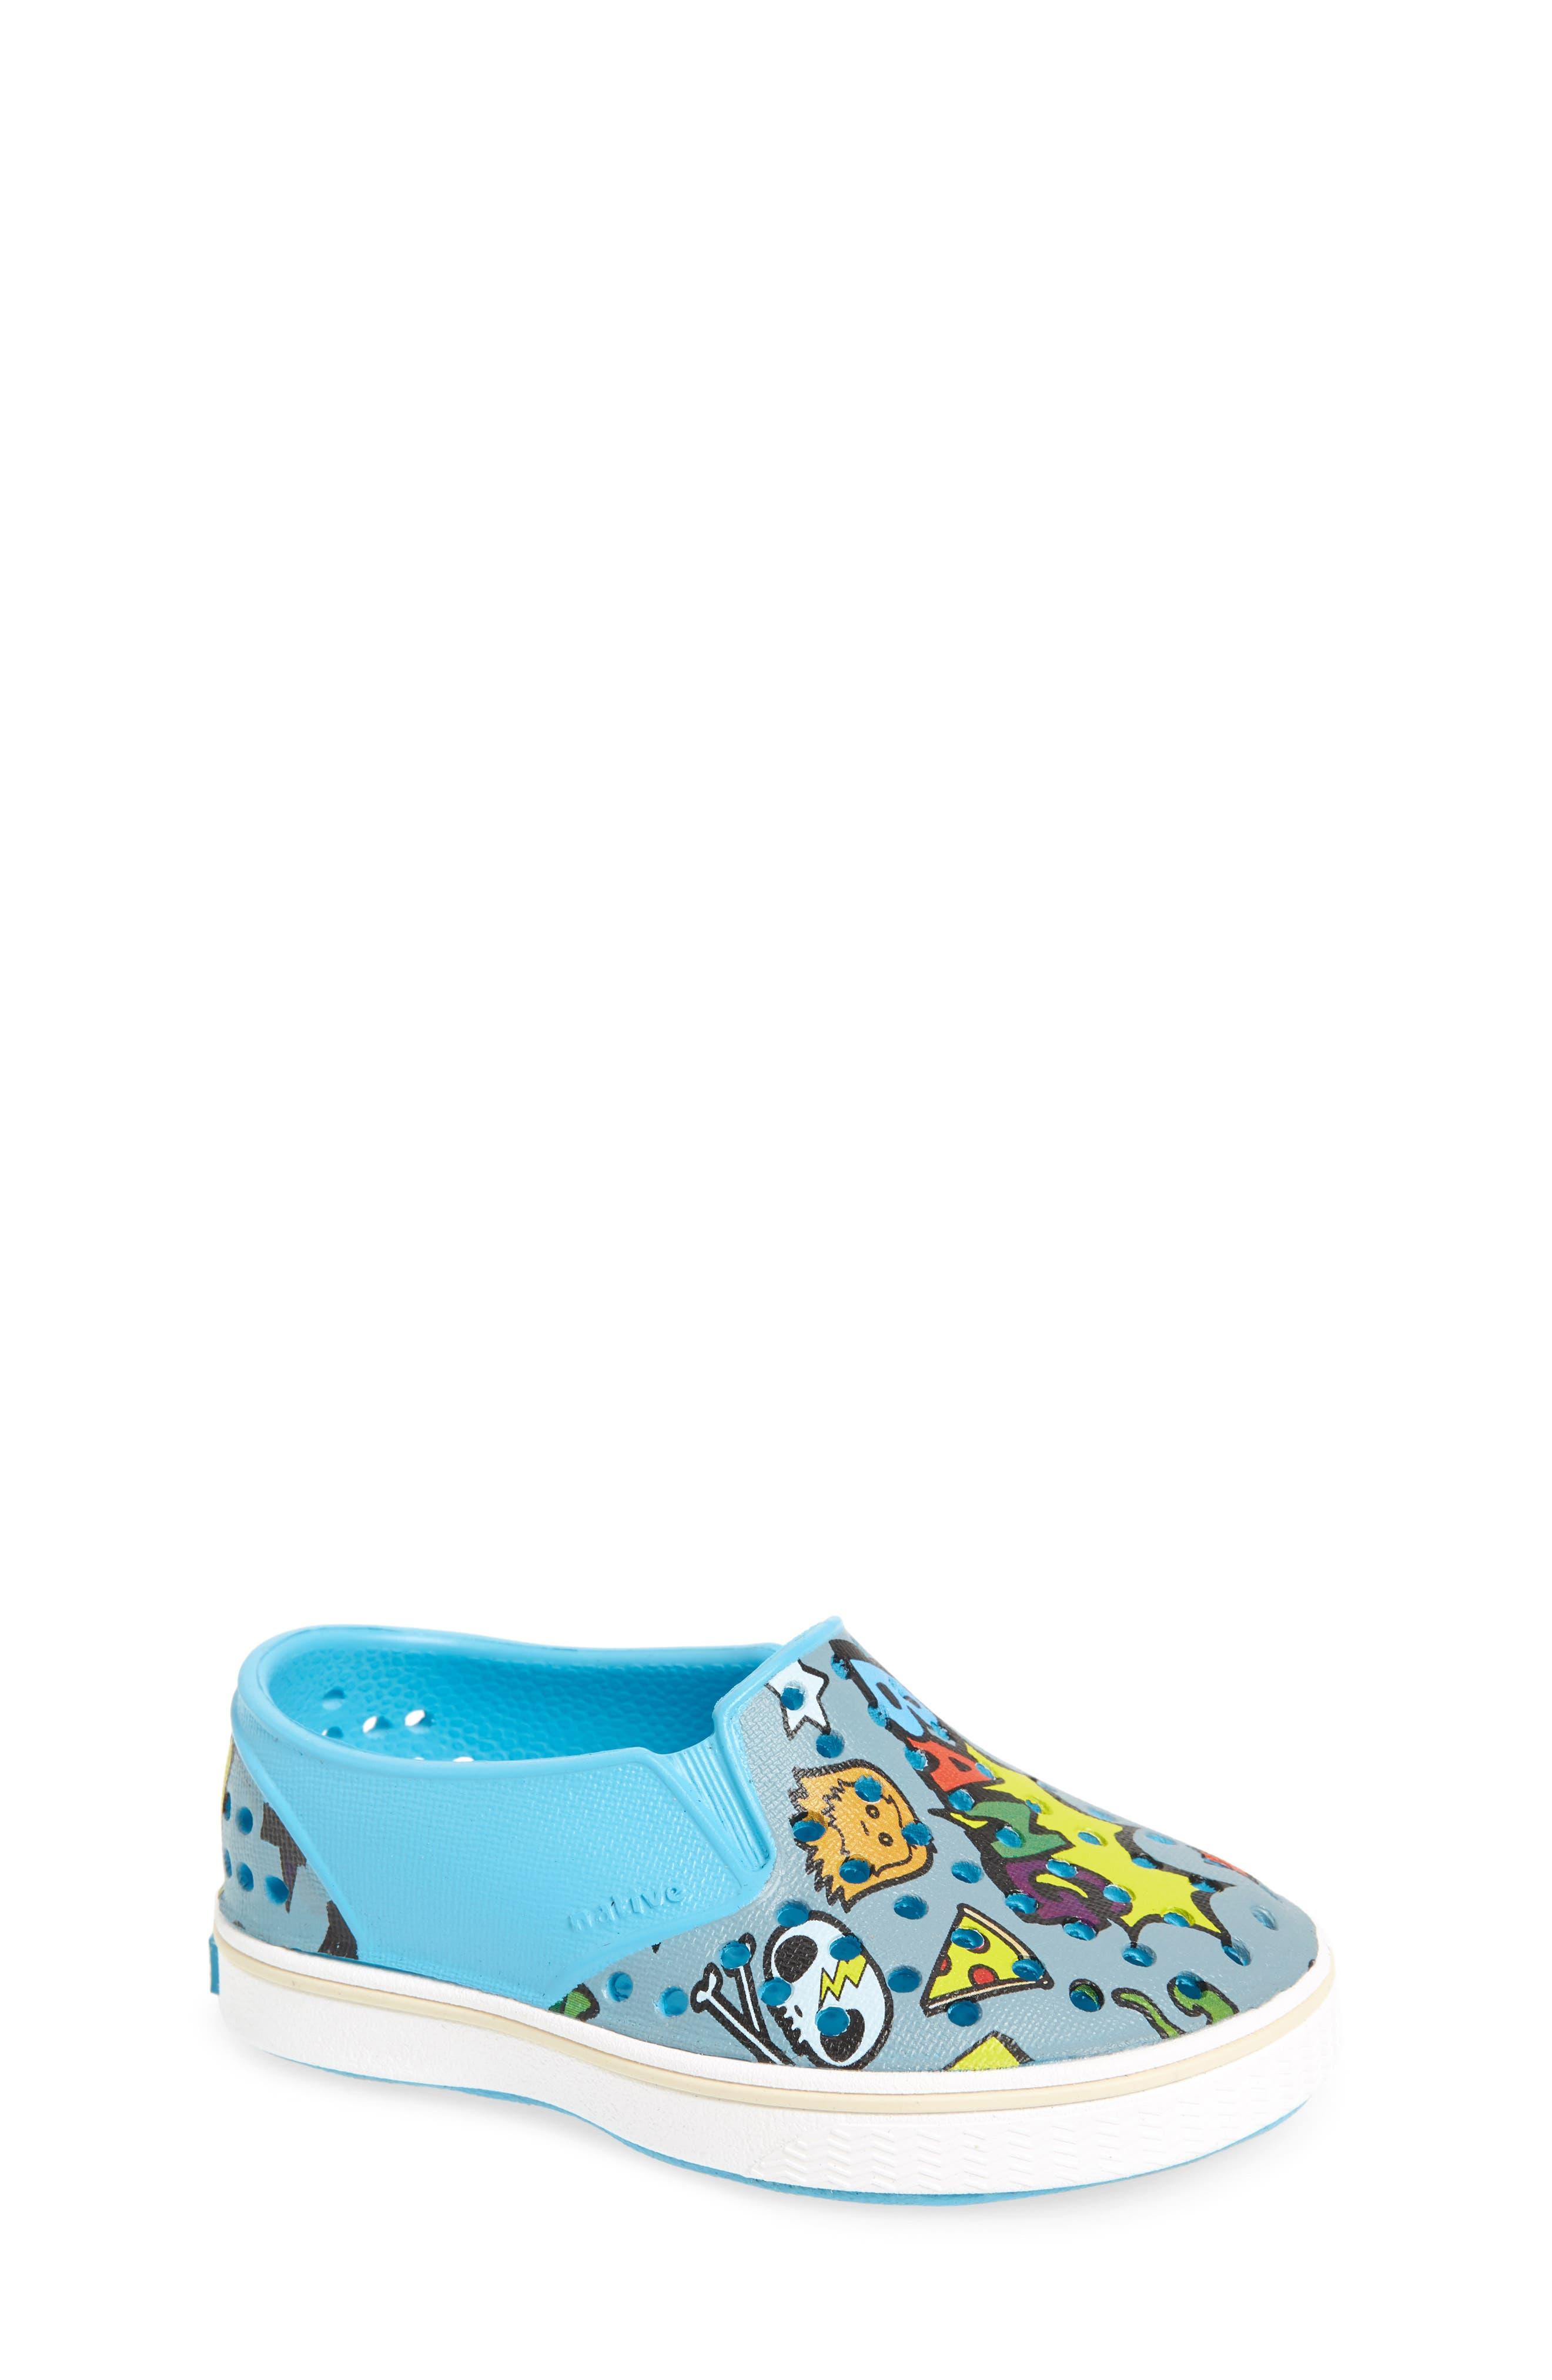 Alternate Image 1 Selected - Native Shoes Miles Print Slip-On Sneaker (Baby, Walker, Toddler, Little Kid & Big Kid)